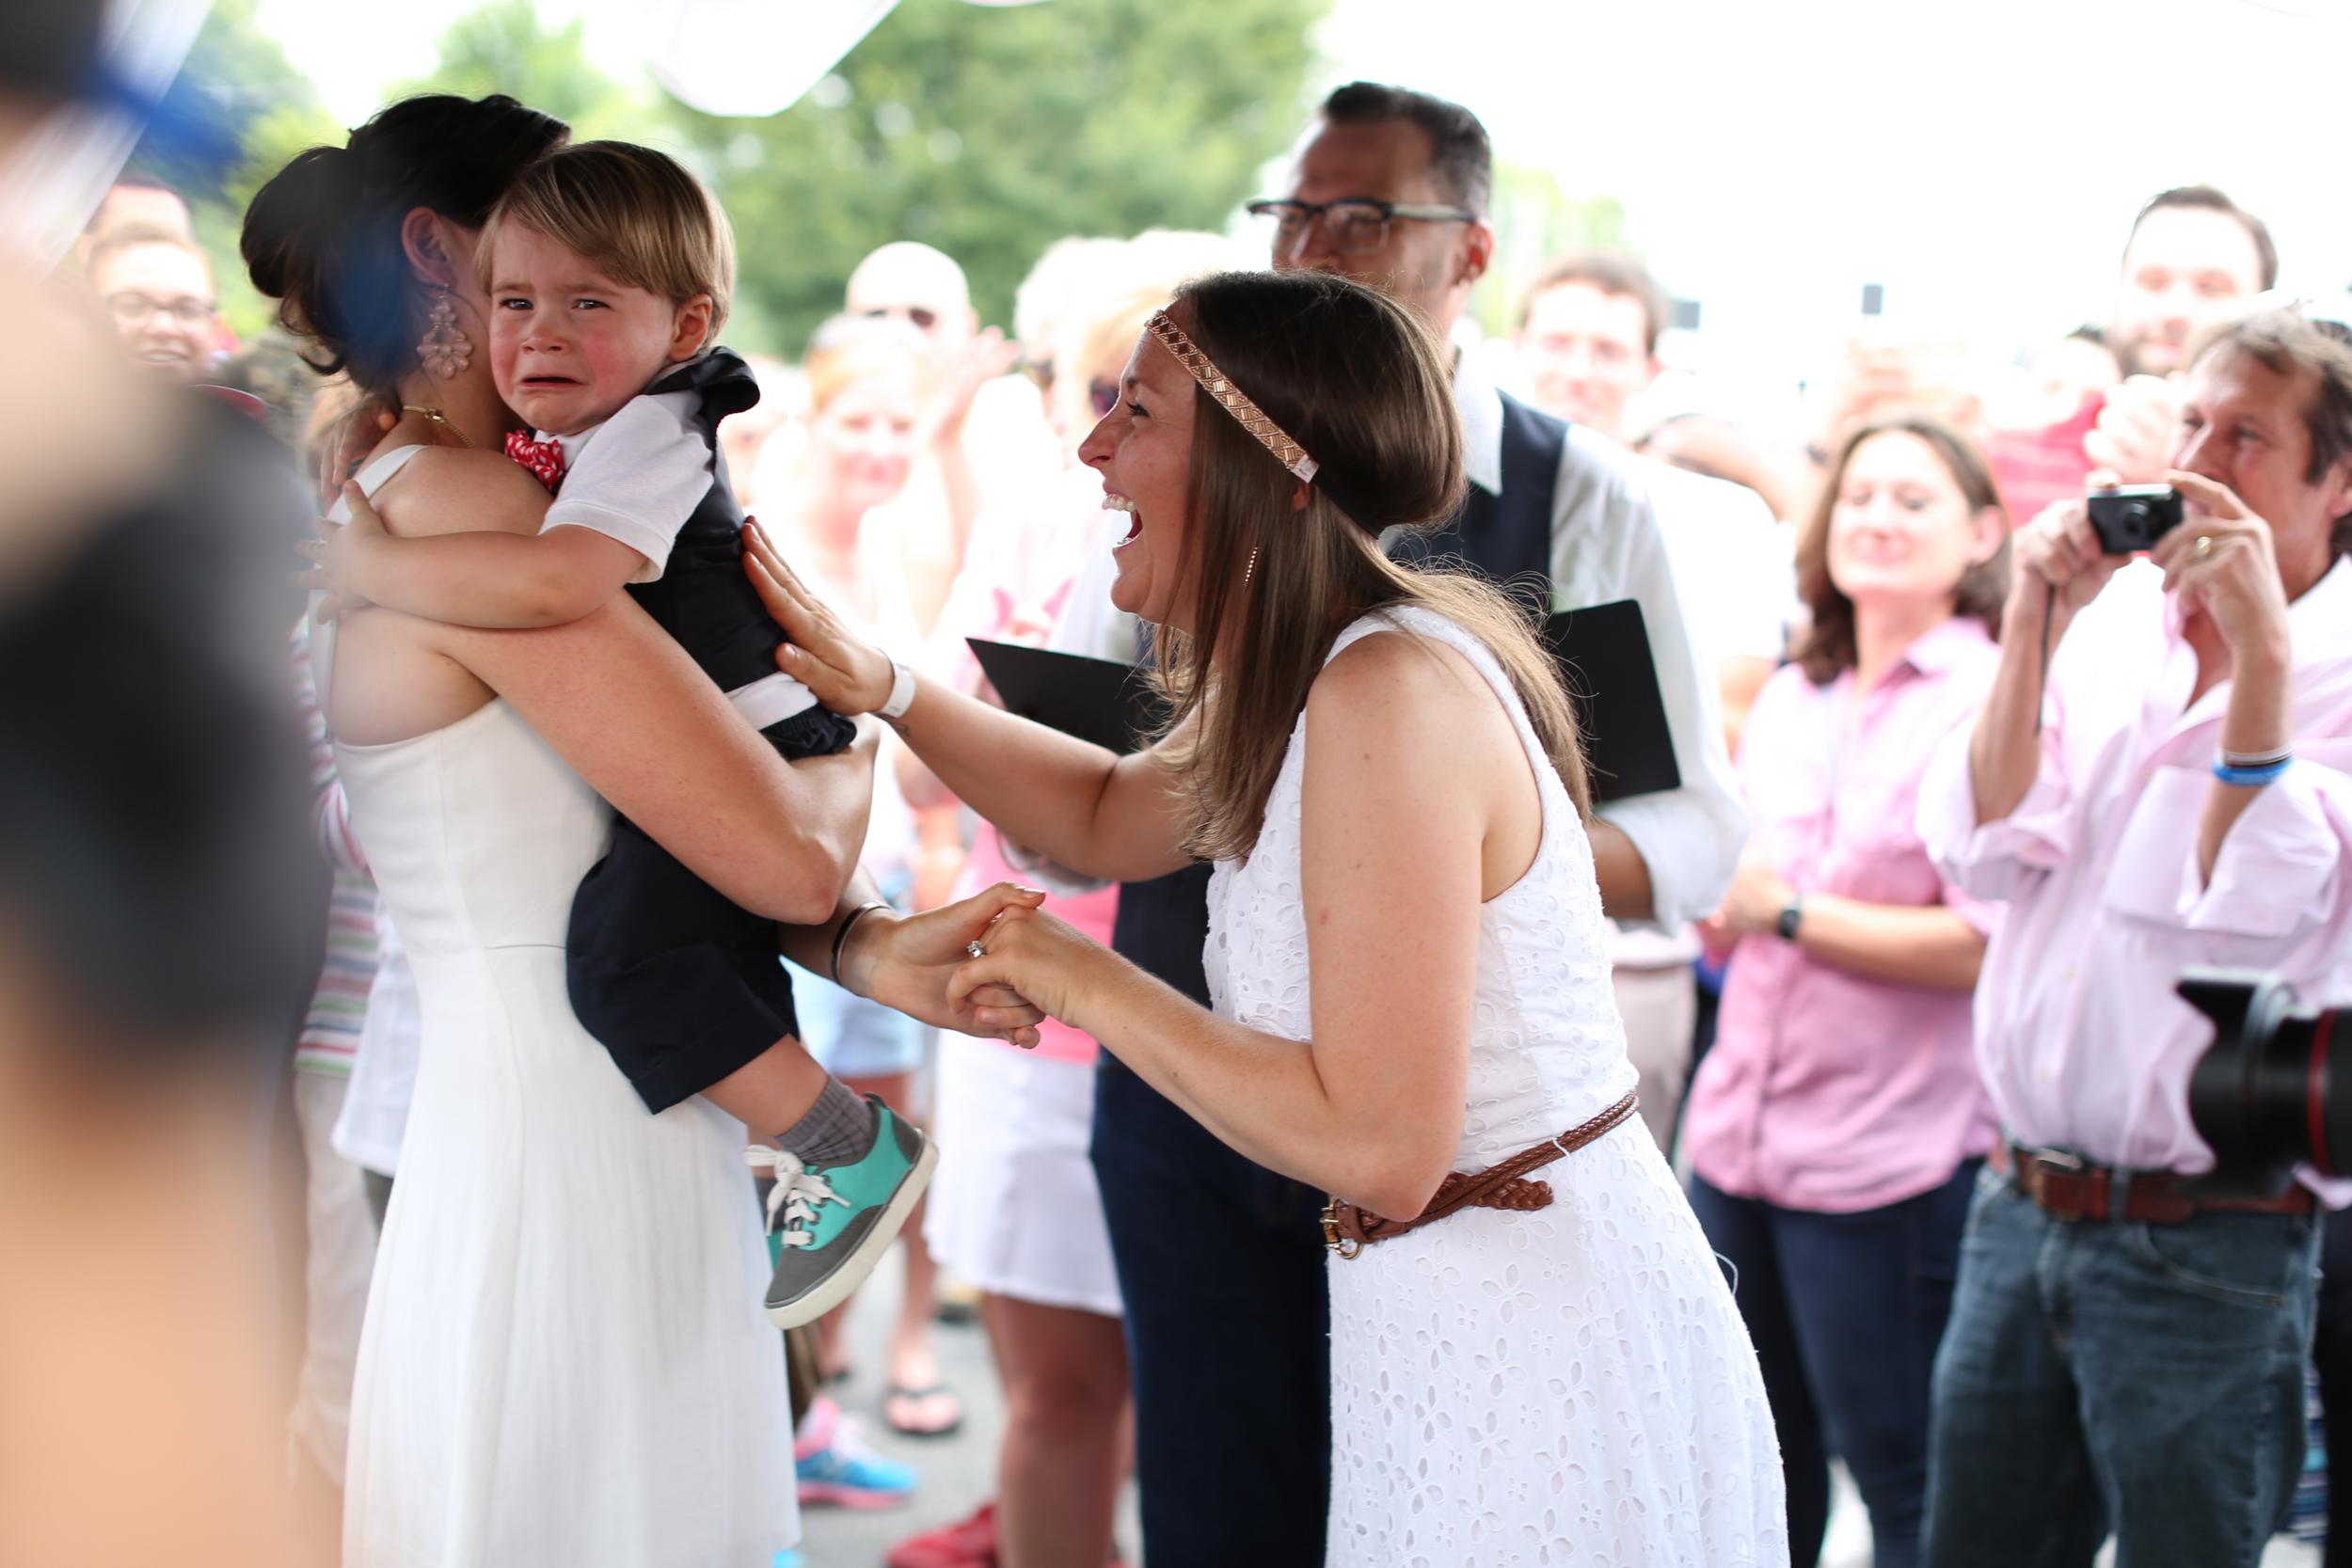 FEVA TAPROOM MARRIAGE CELBRATION SCOTUS RULING 2015 WEBSITE  (49 of 91).jpg